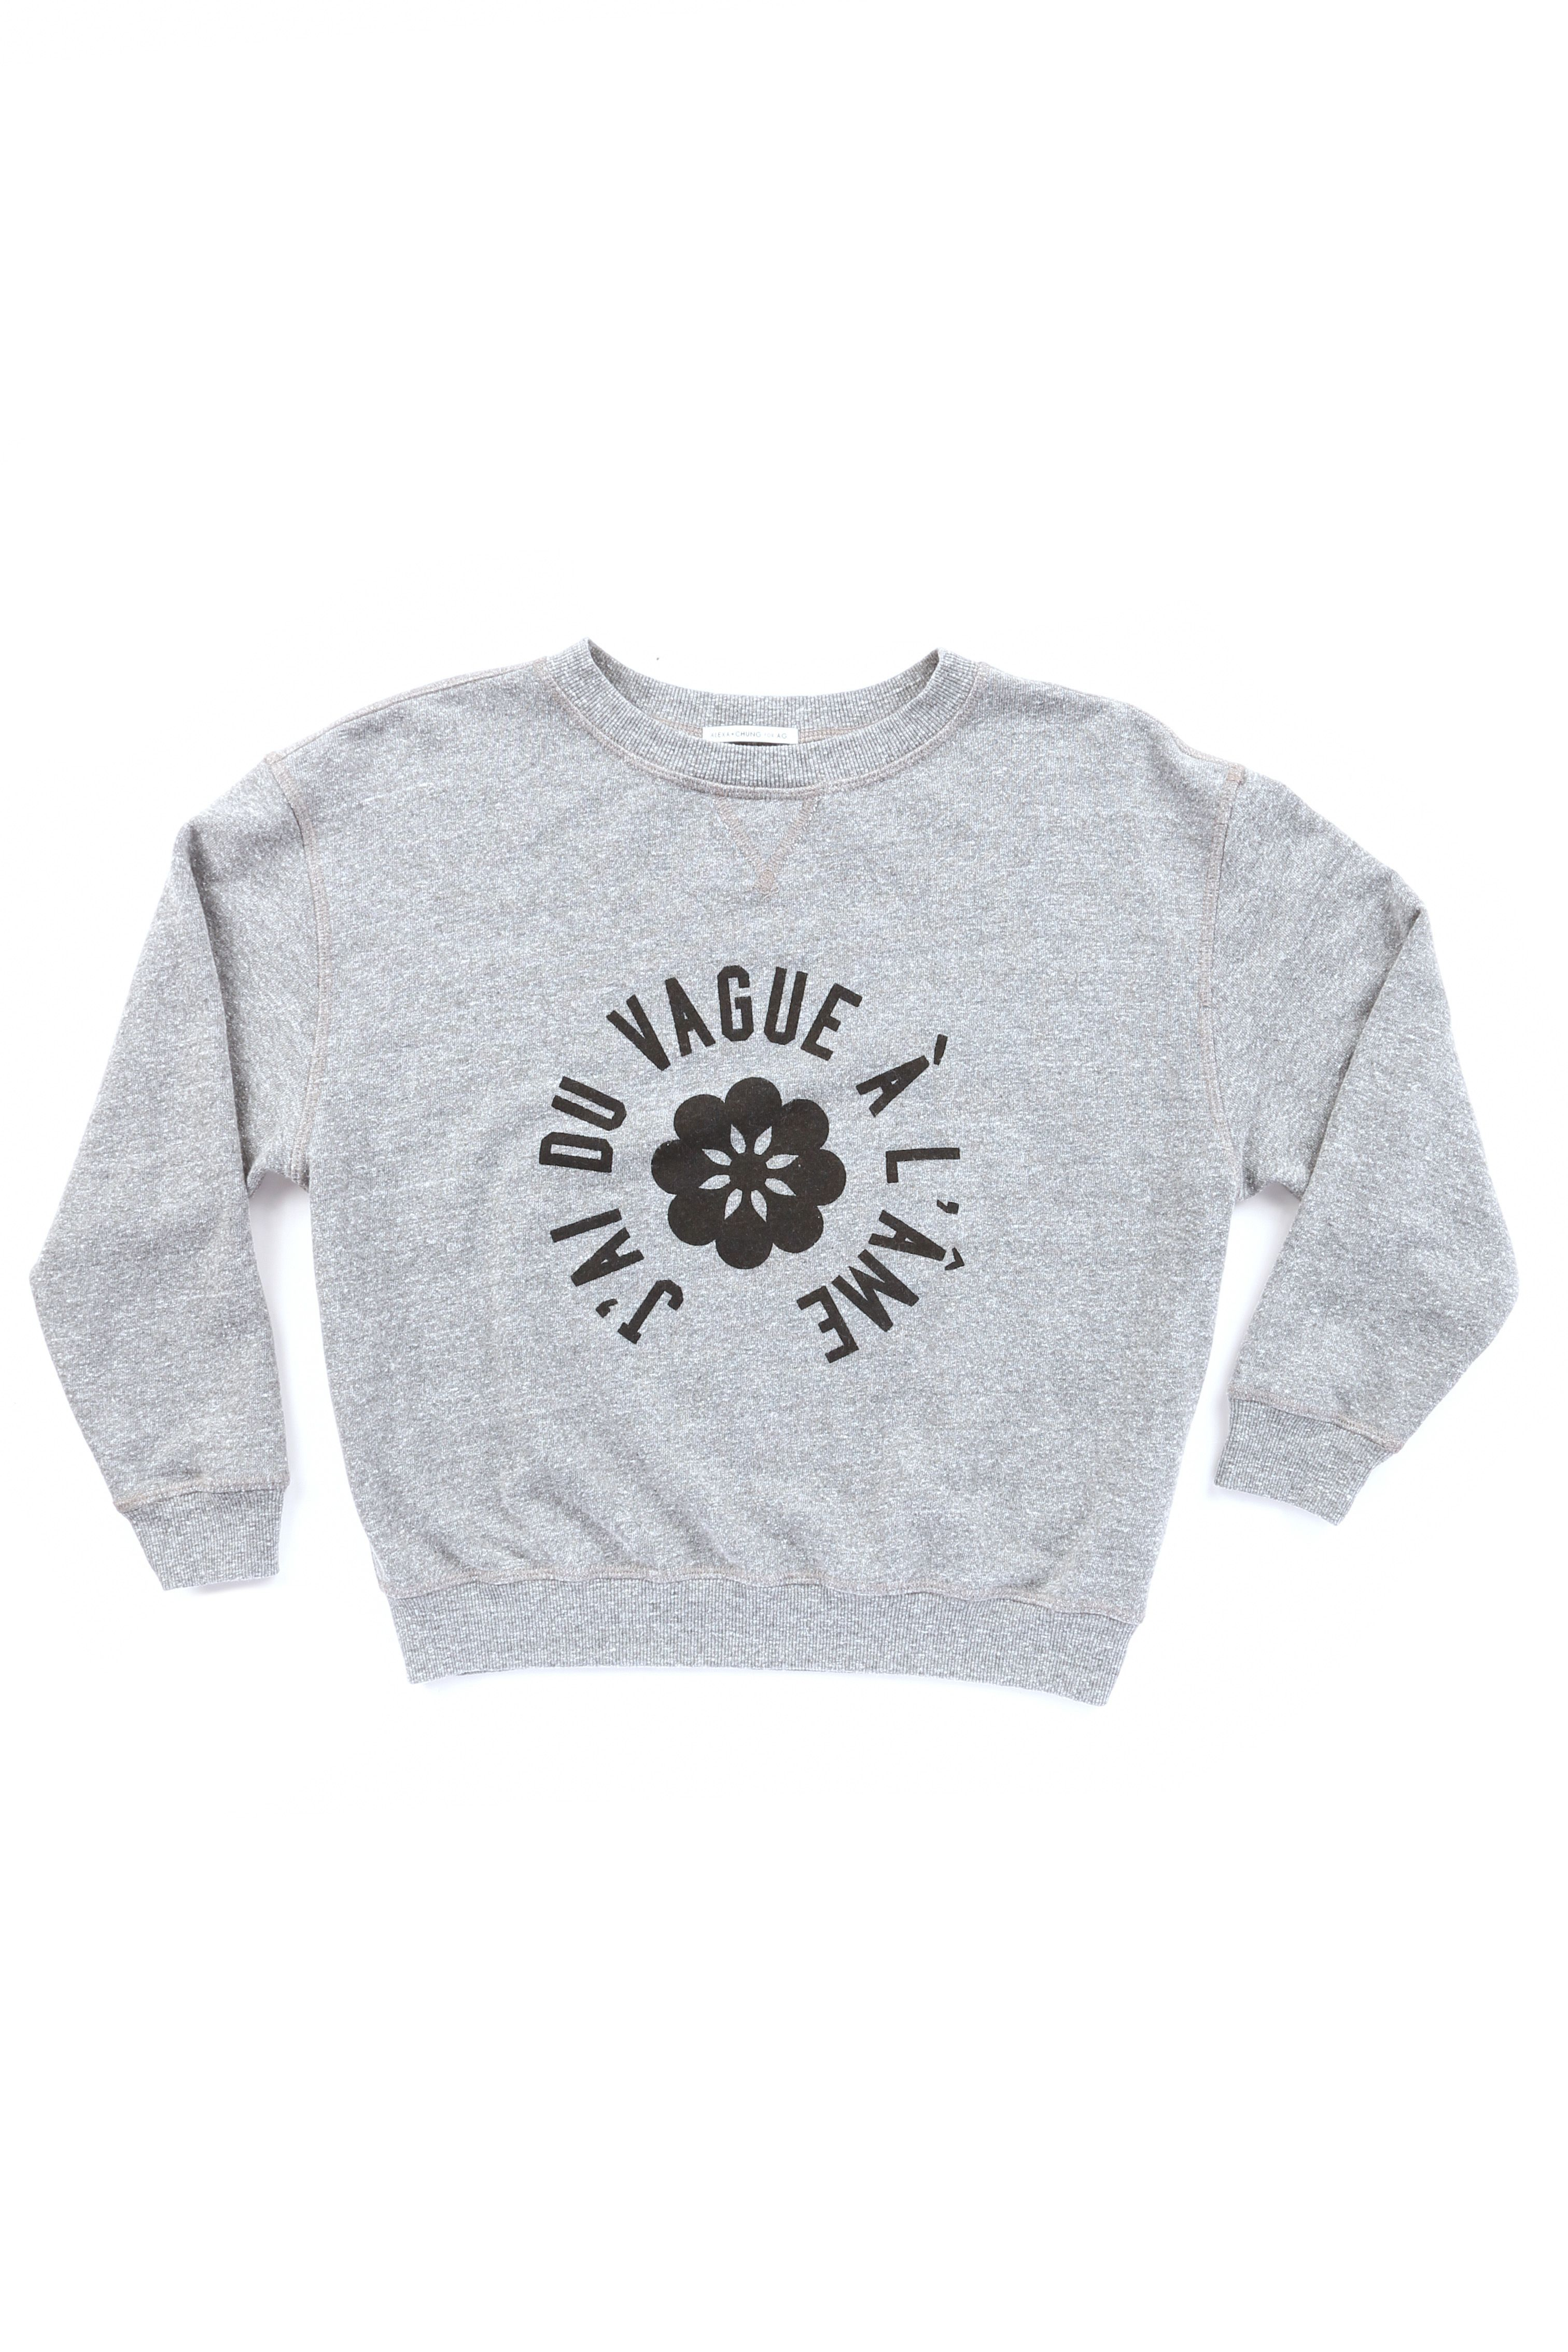 "Heather Grey The New Wave Sweatshirt, $240; <a href=""http://www.avenue32.com/us/designers/alexa-chung-x-ag/"" target=""_blank"">avenue32.com</a>"